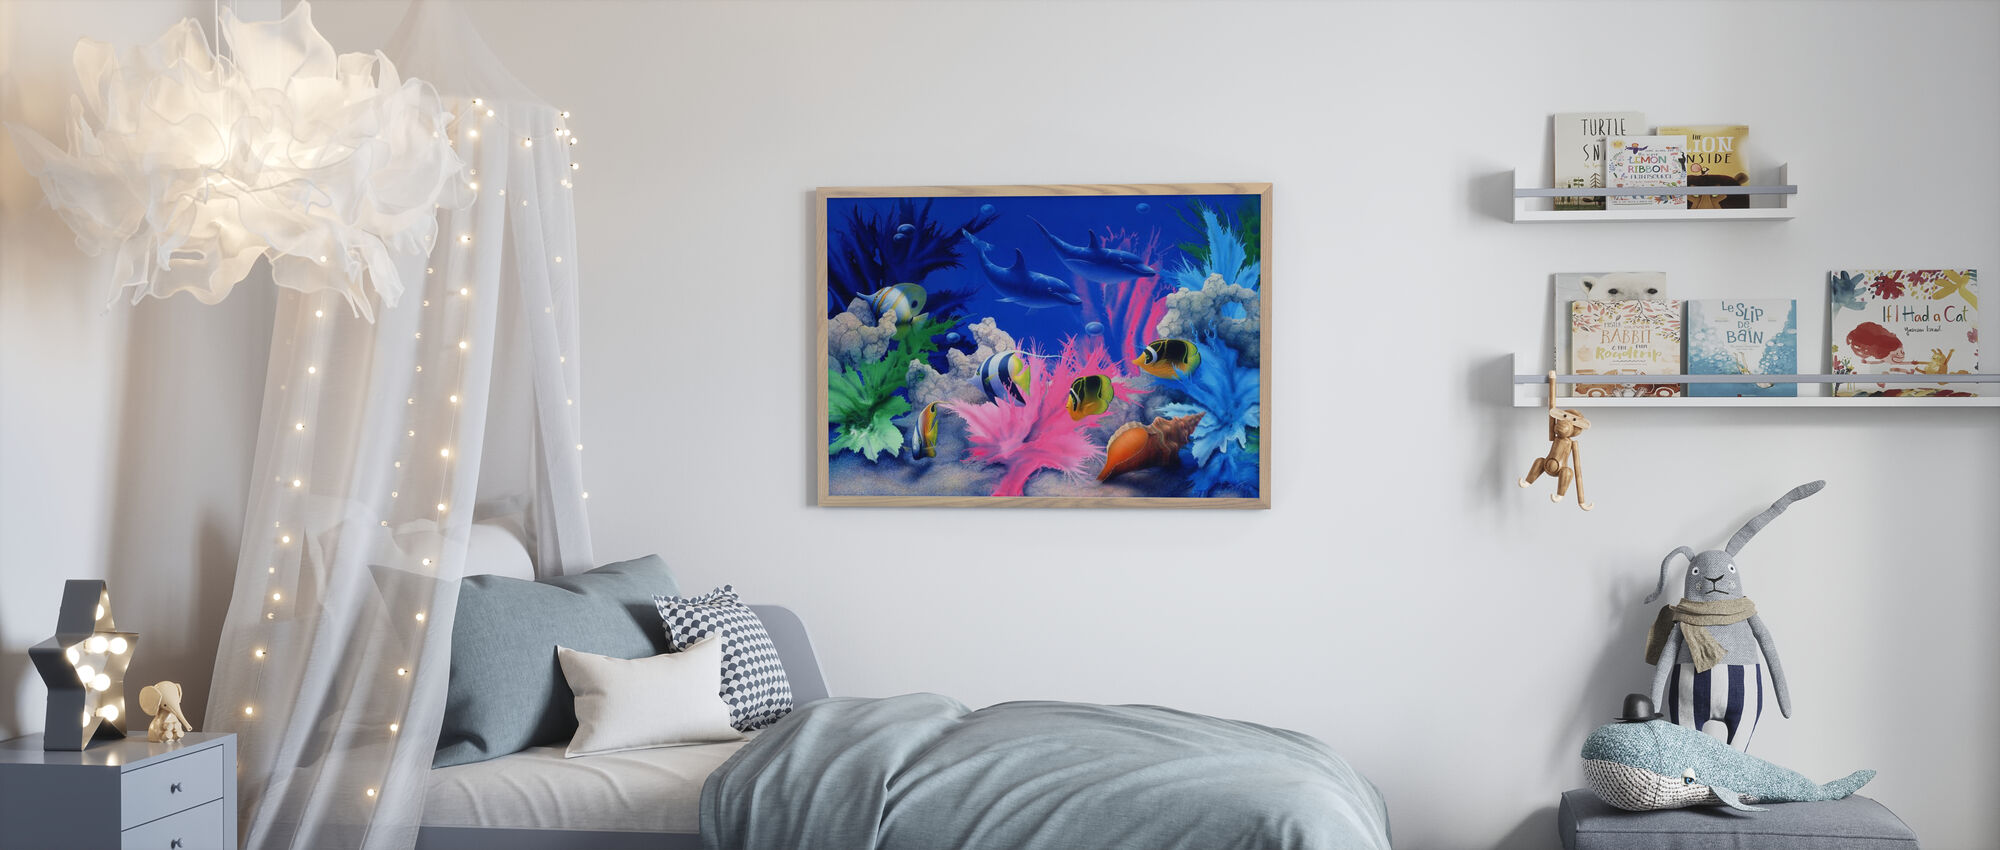 Vivid - Poster - Kids Room